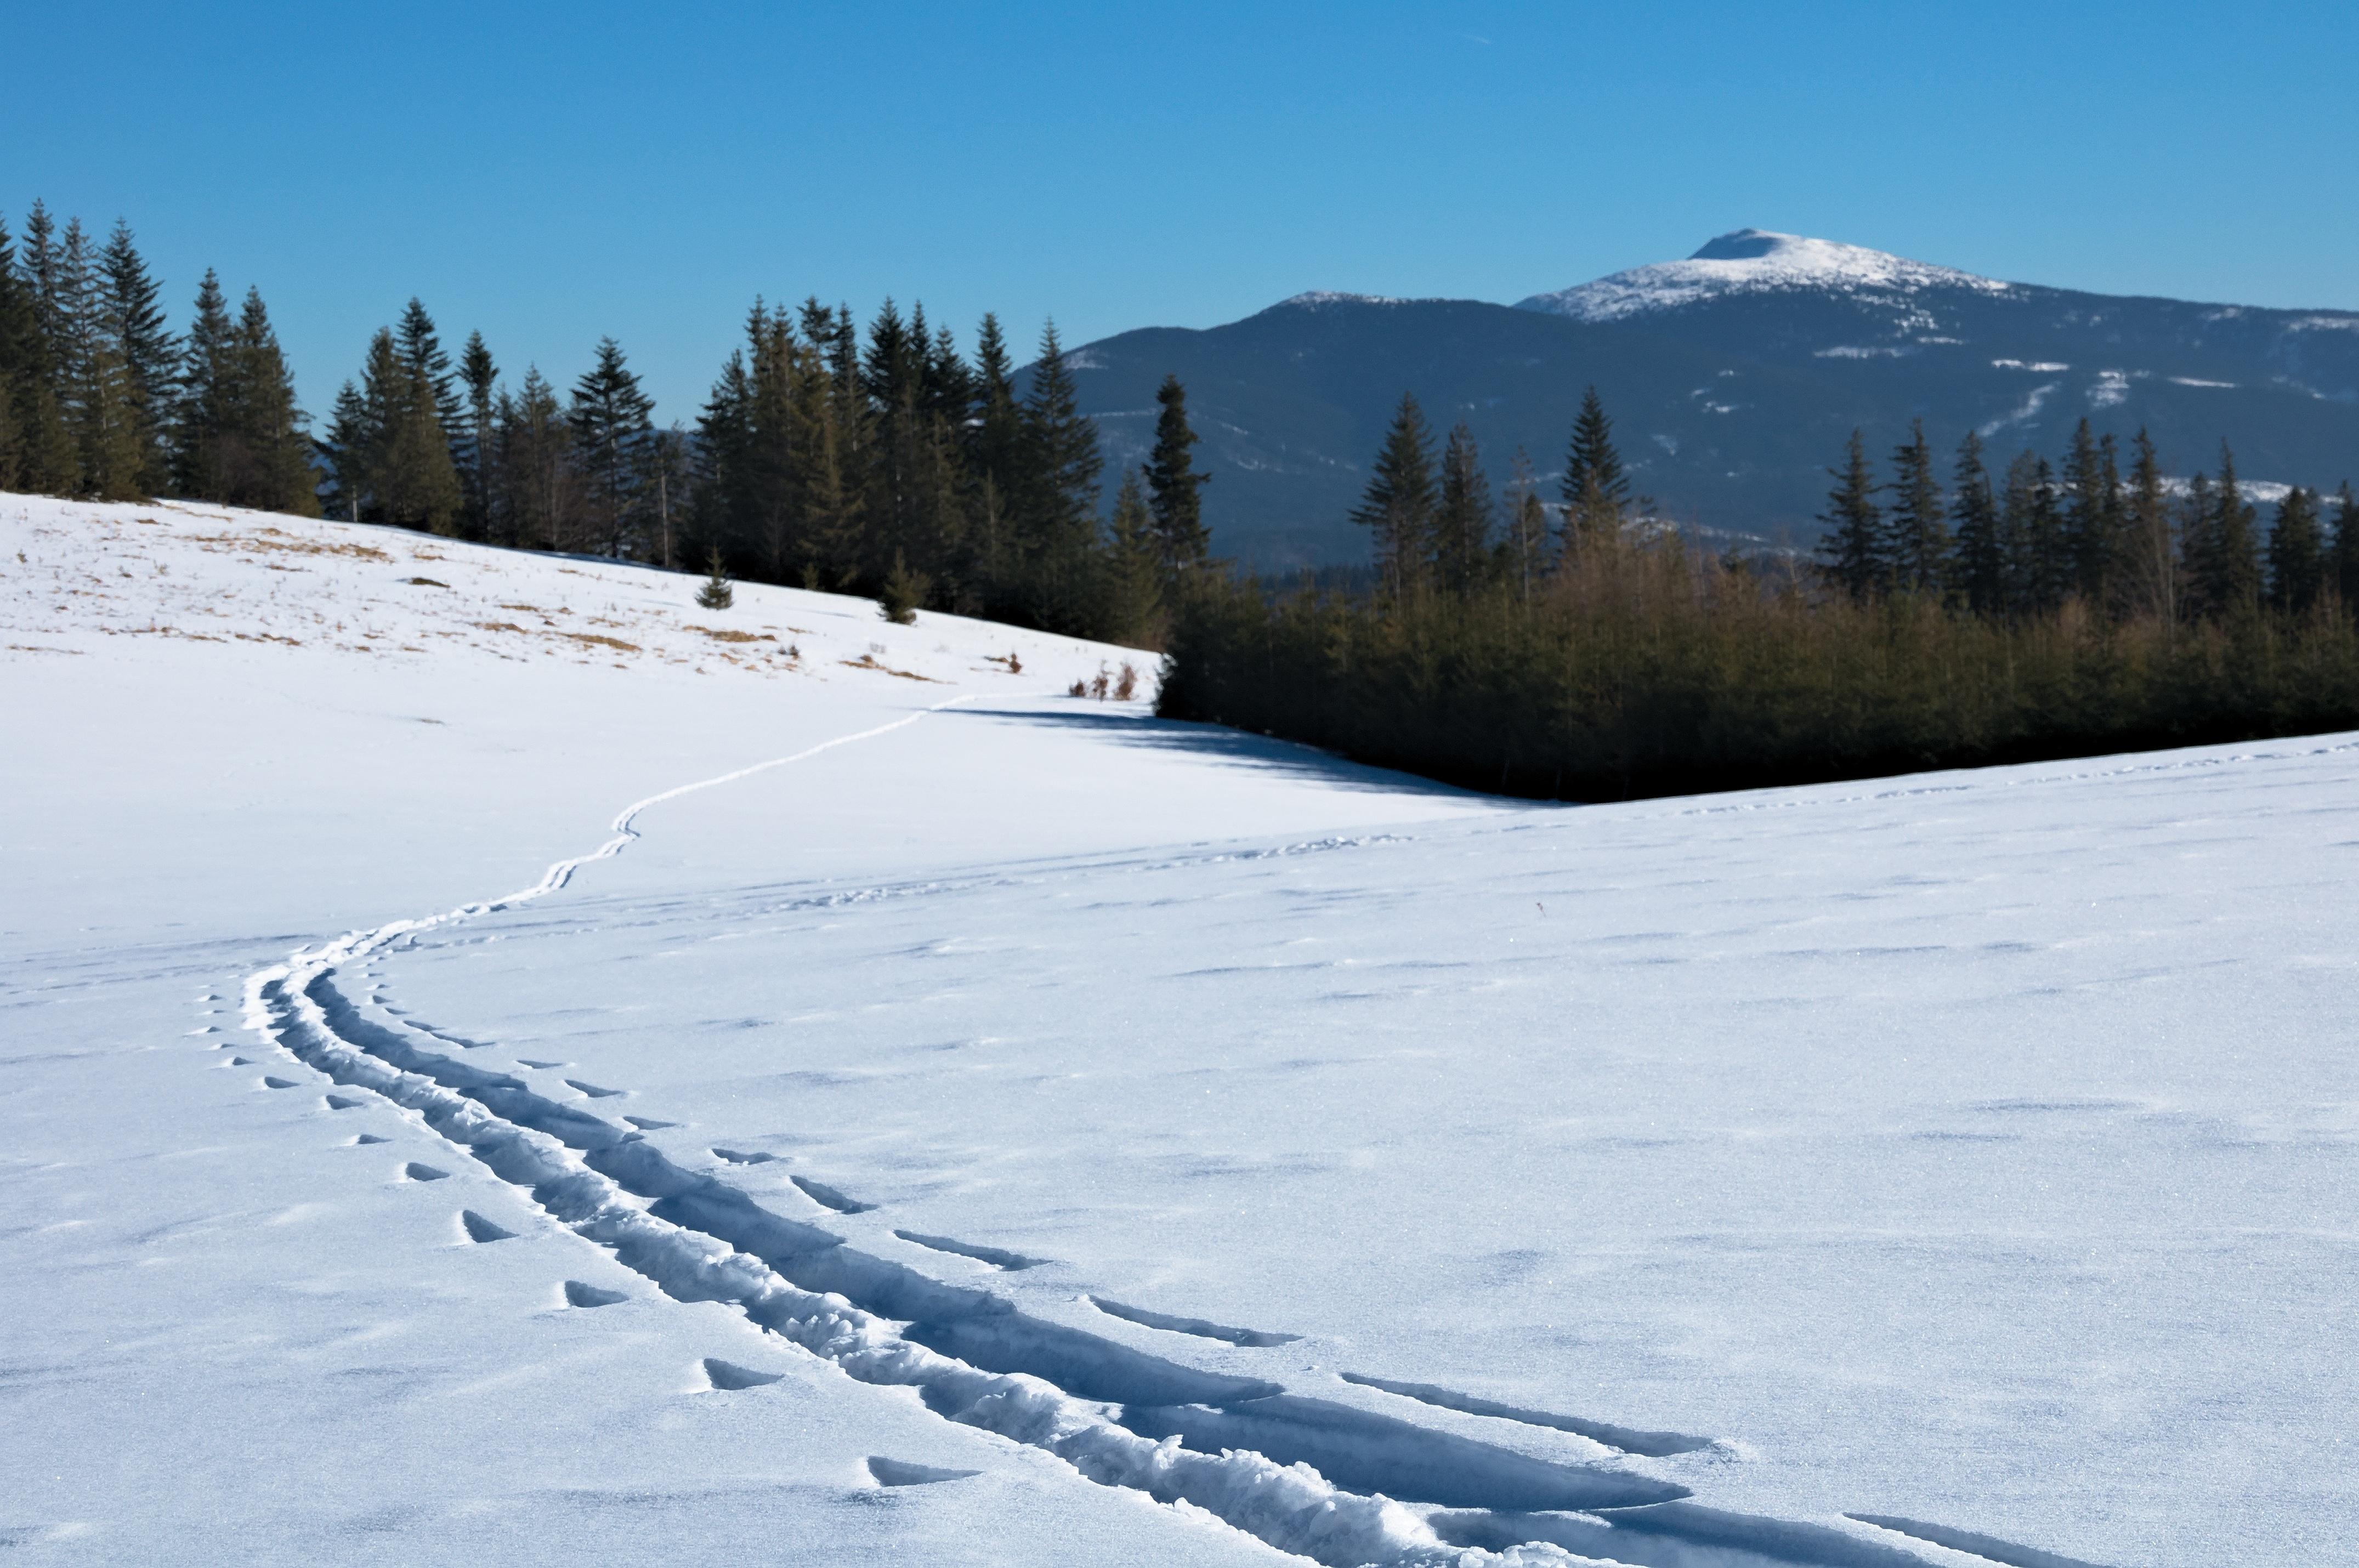 виды снега картинки рублёва сложилось